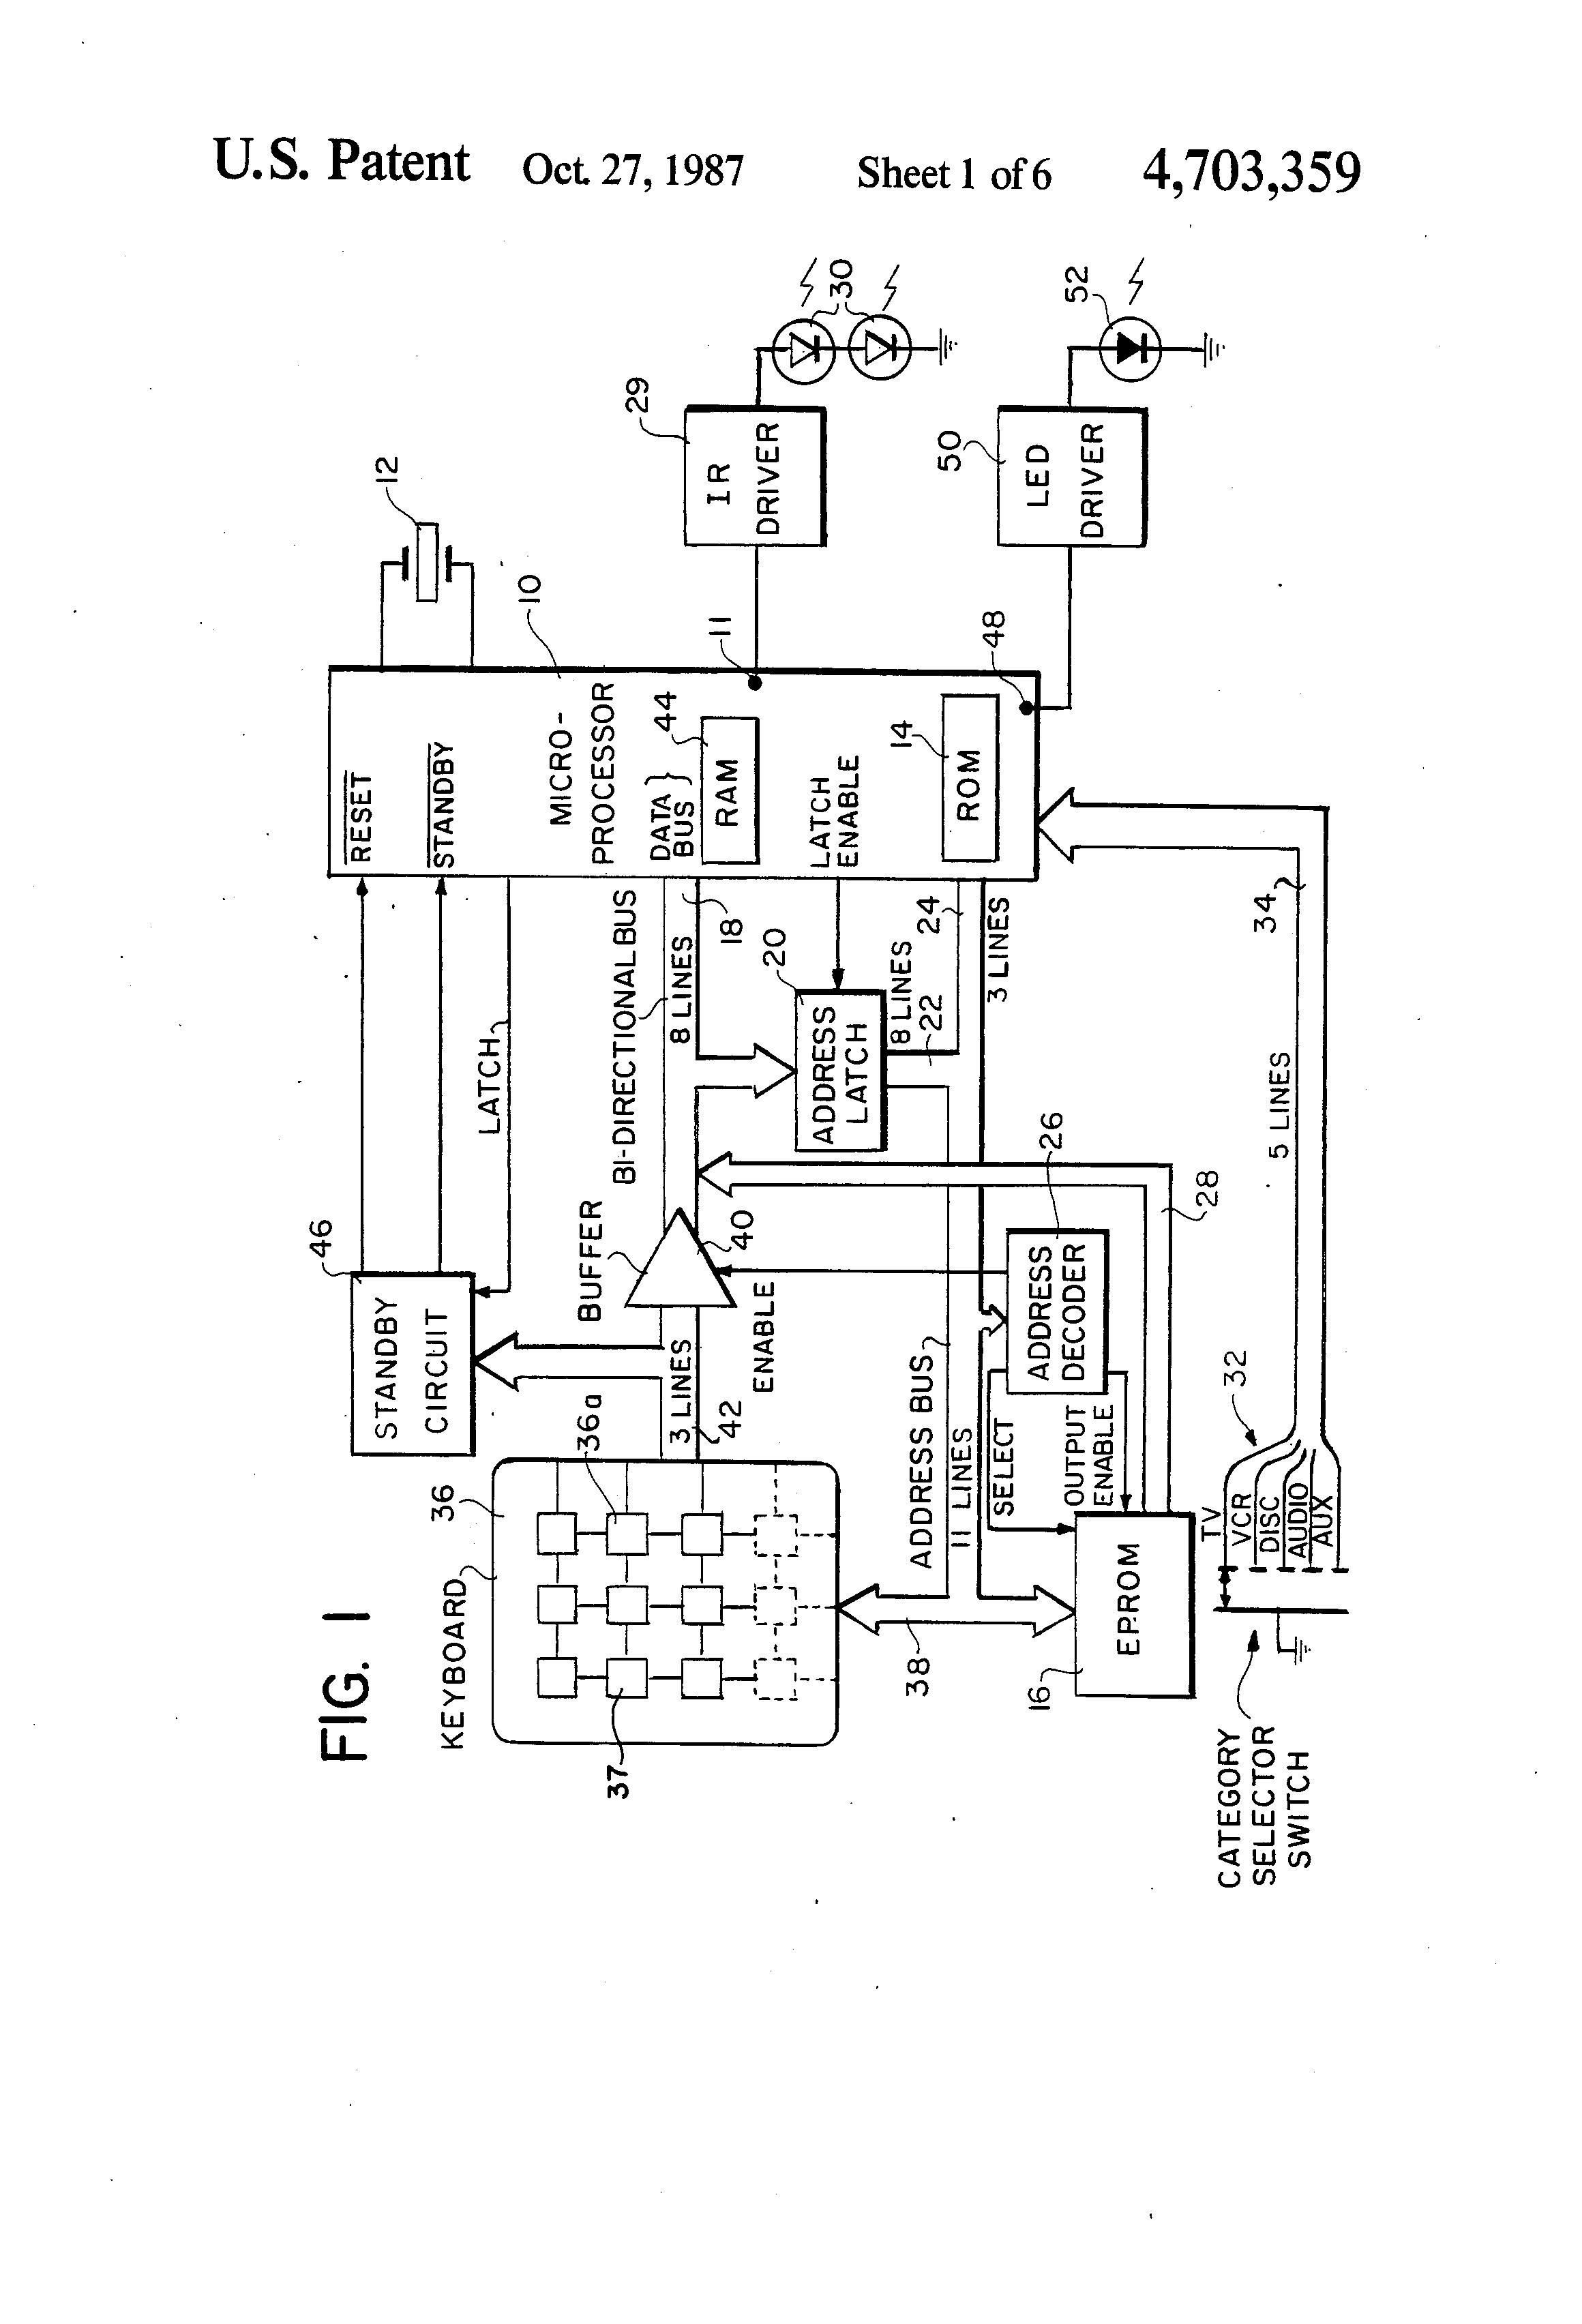 Ready Remote Wiring Diagram Kbid Airport Diagram Wiring Diagram Review